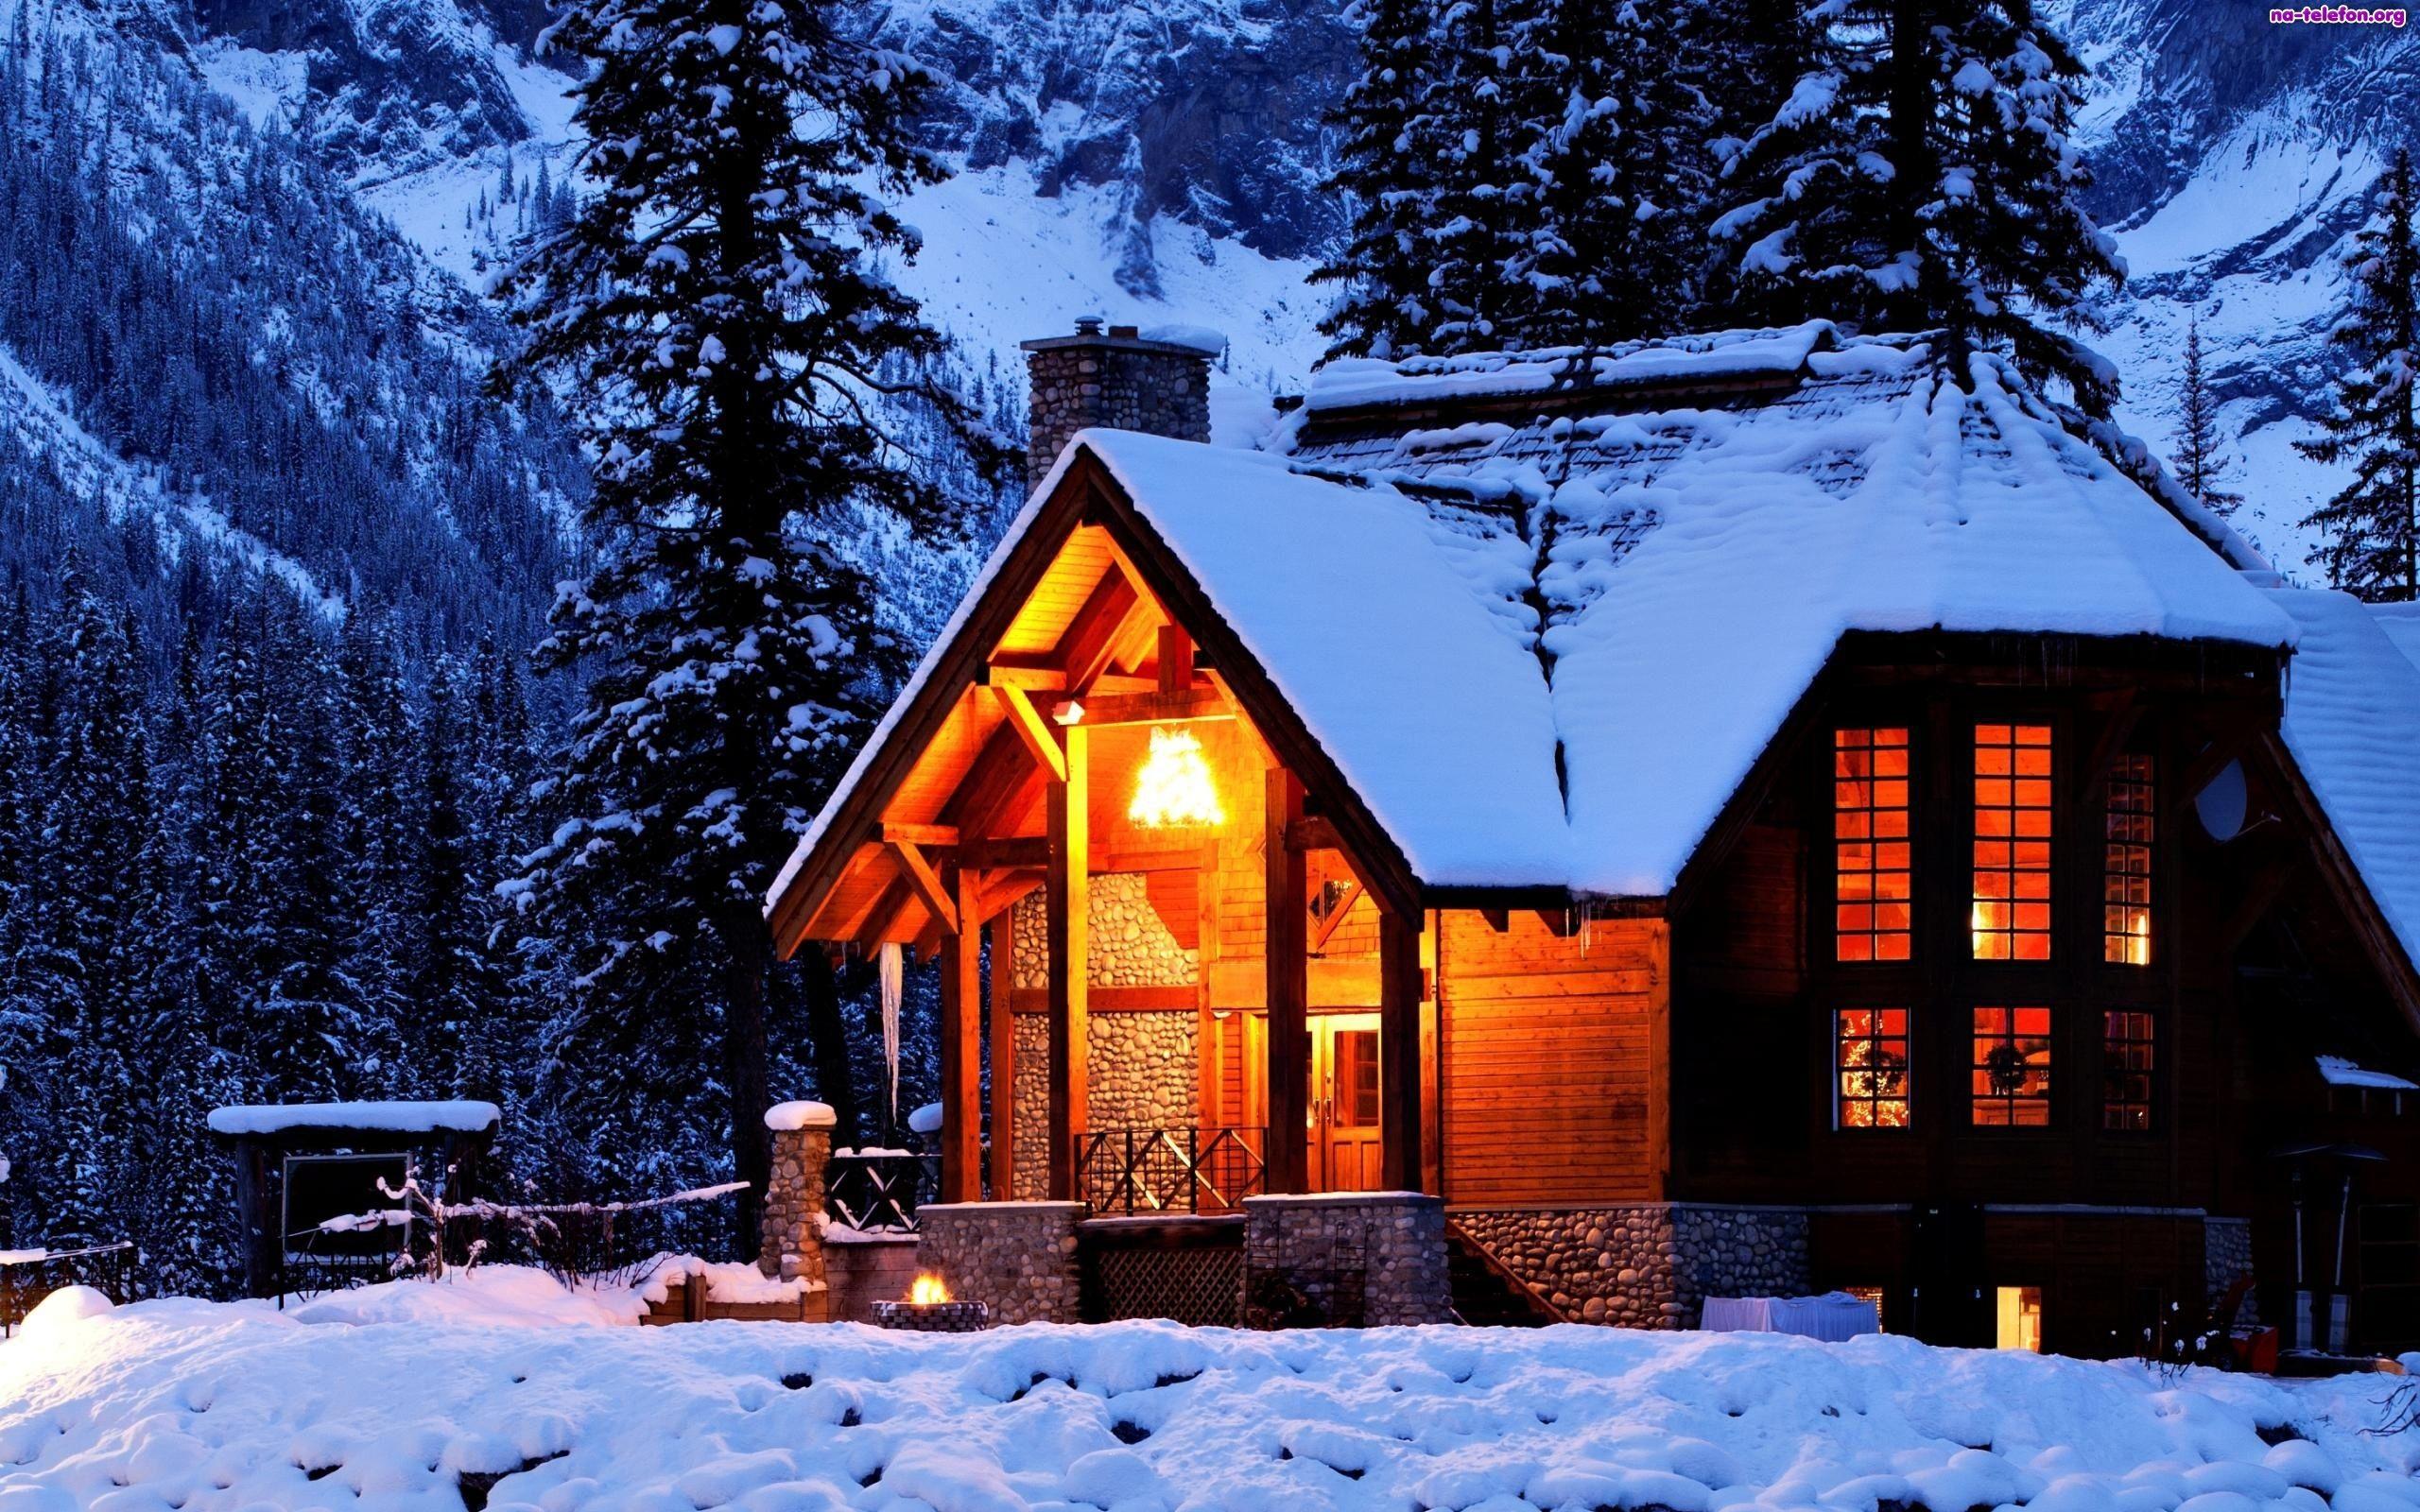 E Oswietlony Domek Zima Gory Winter House House In The Woods Resort Cabins